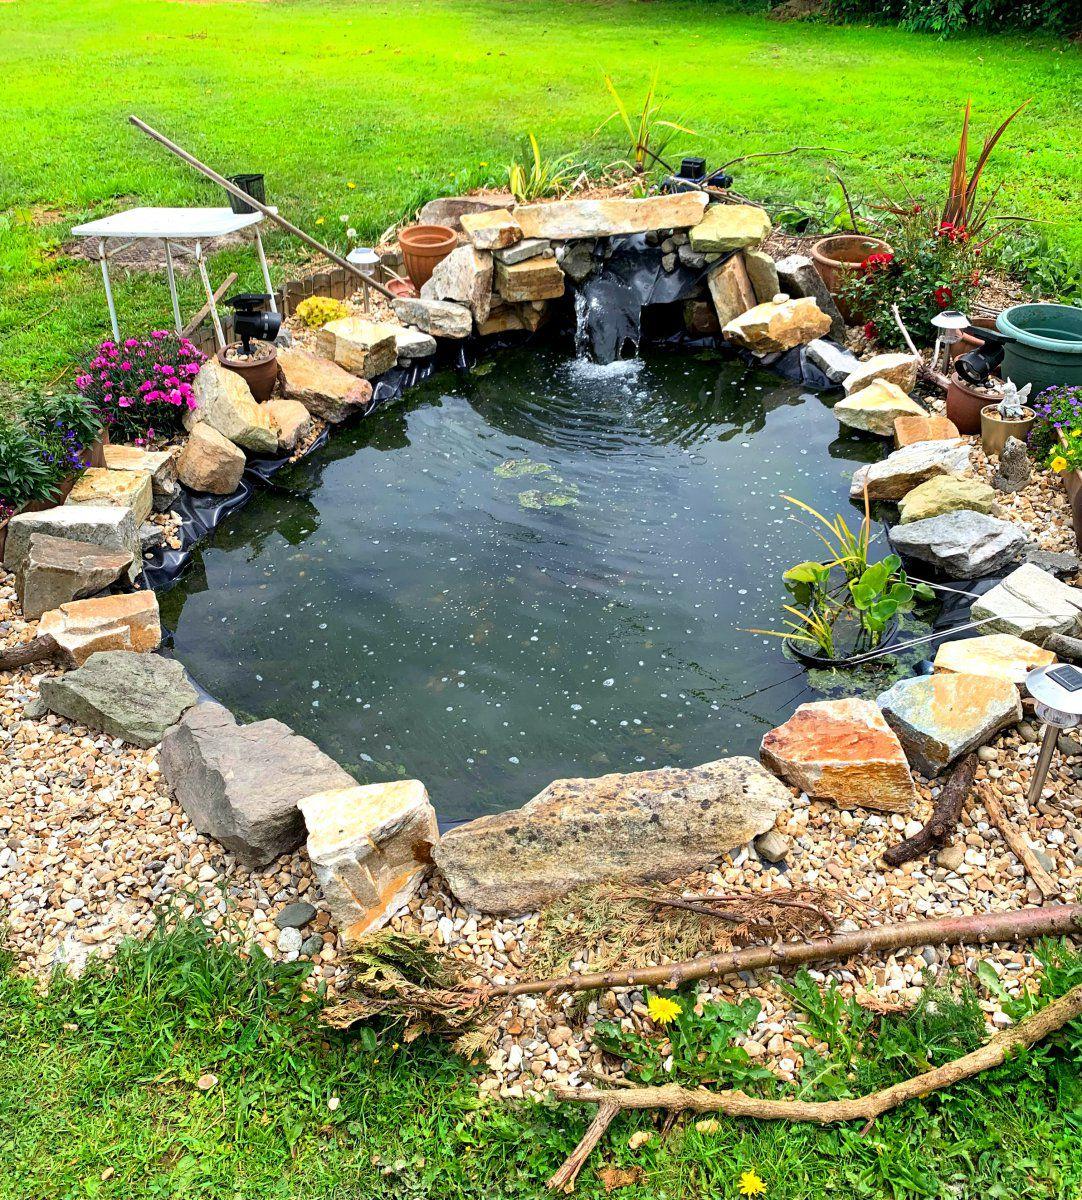 My Garden Pond In Co. Louth, Ireland.